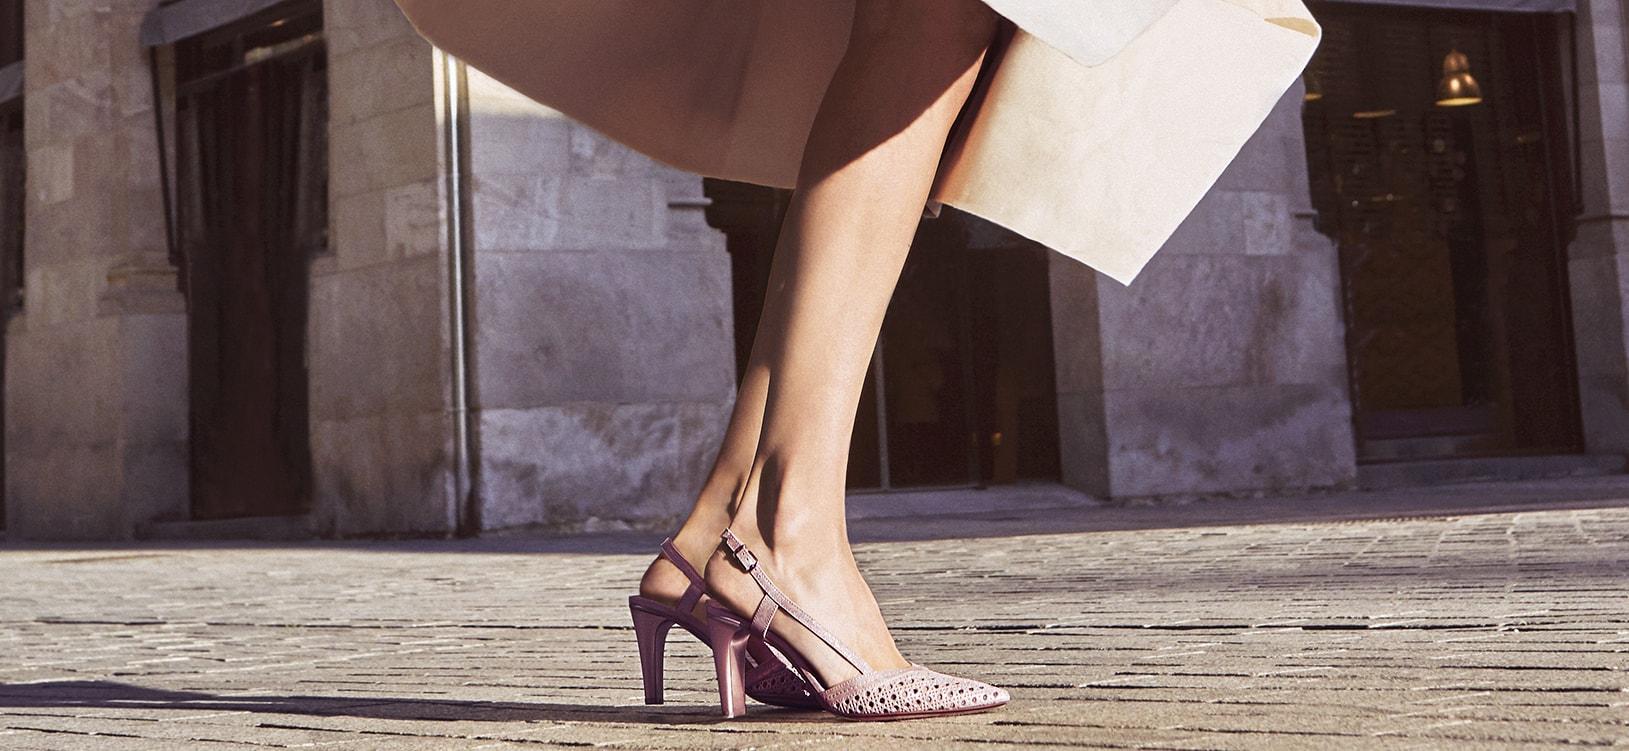 db5045459f8 Γυναικεία παπούτσια - Τσάντες - Αξεσουάρ | Papanikolaou Shoes